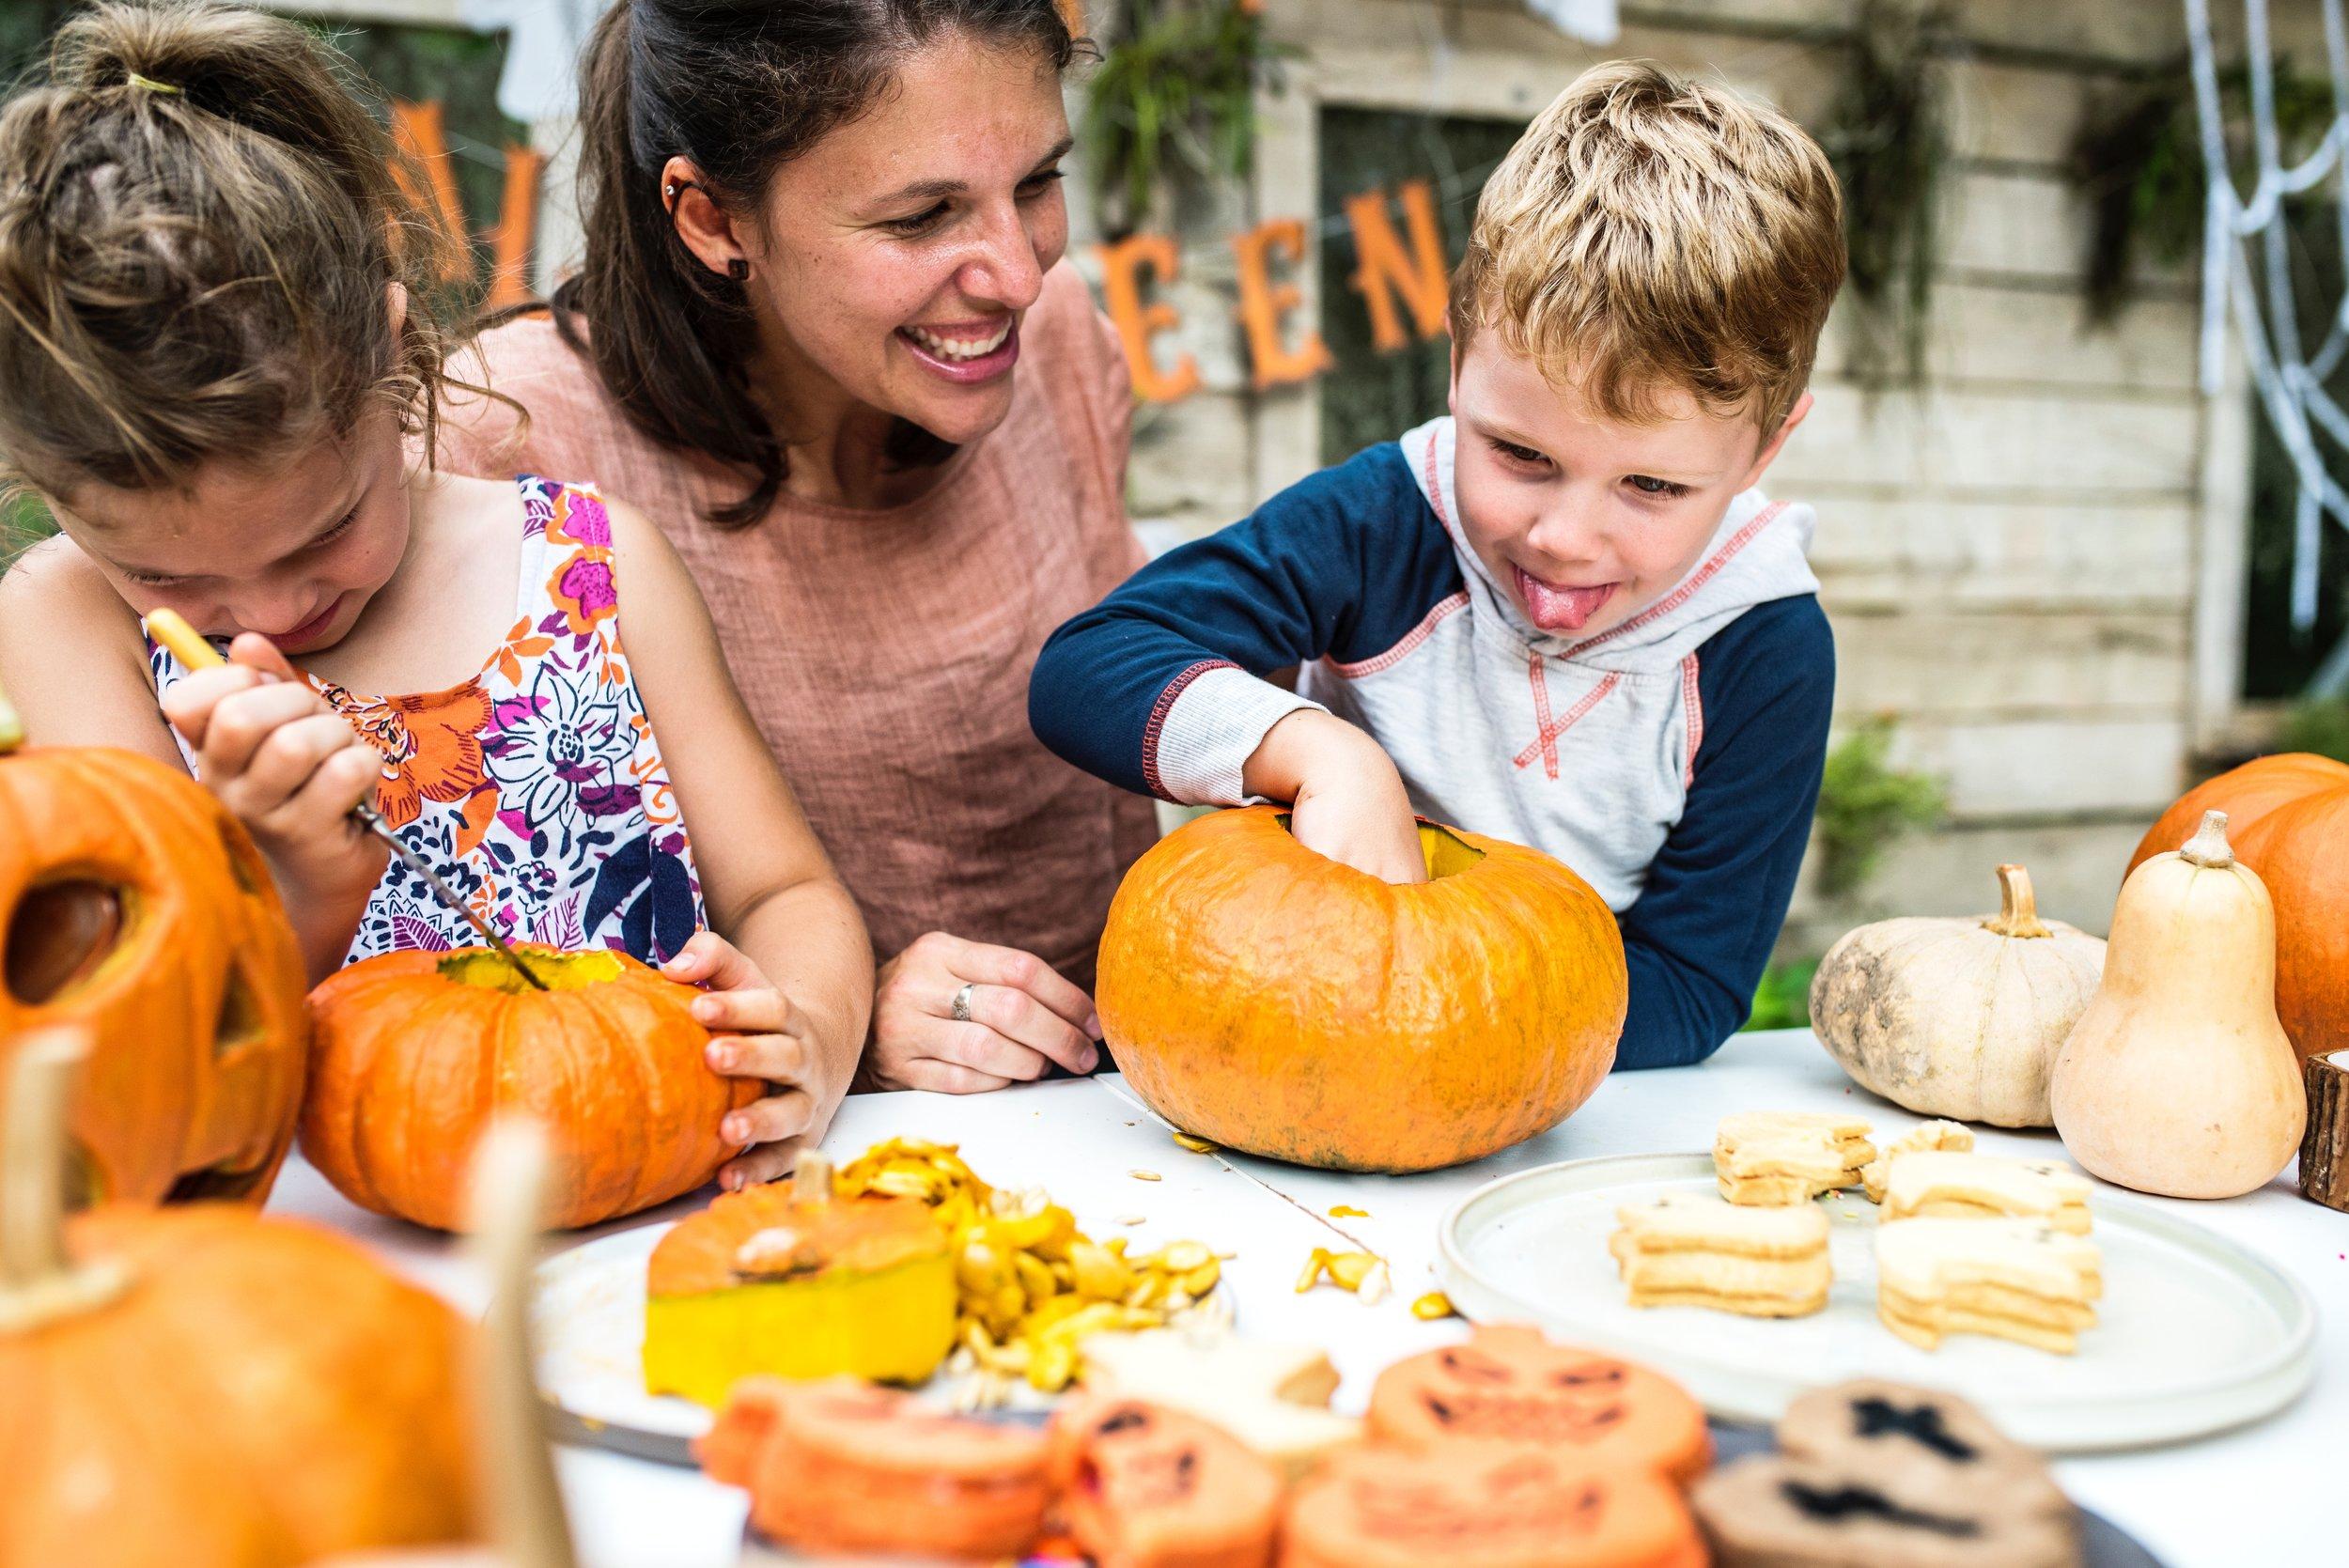 Pumpkin Carving with Kids.jpg